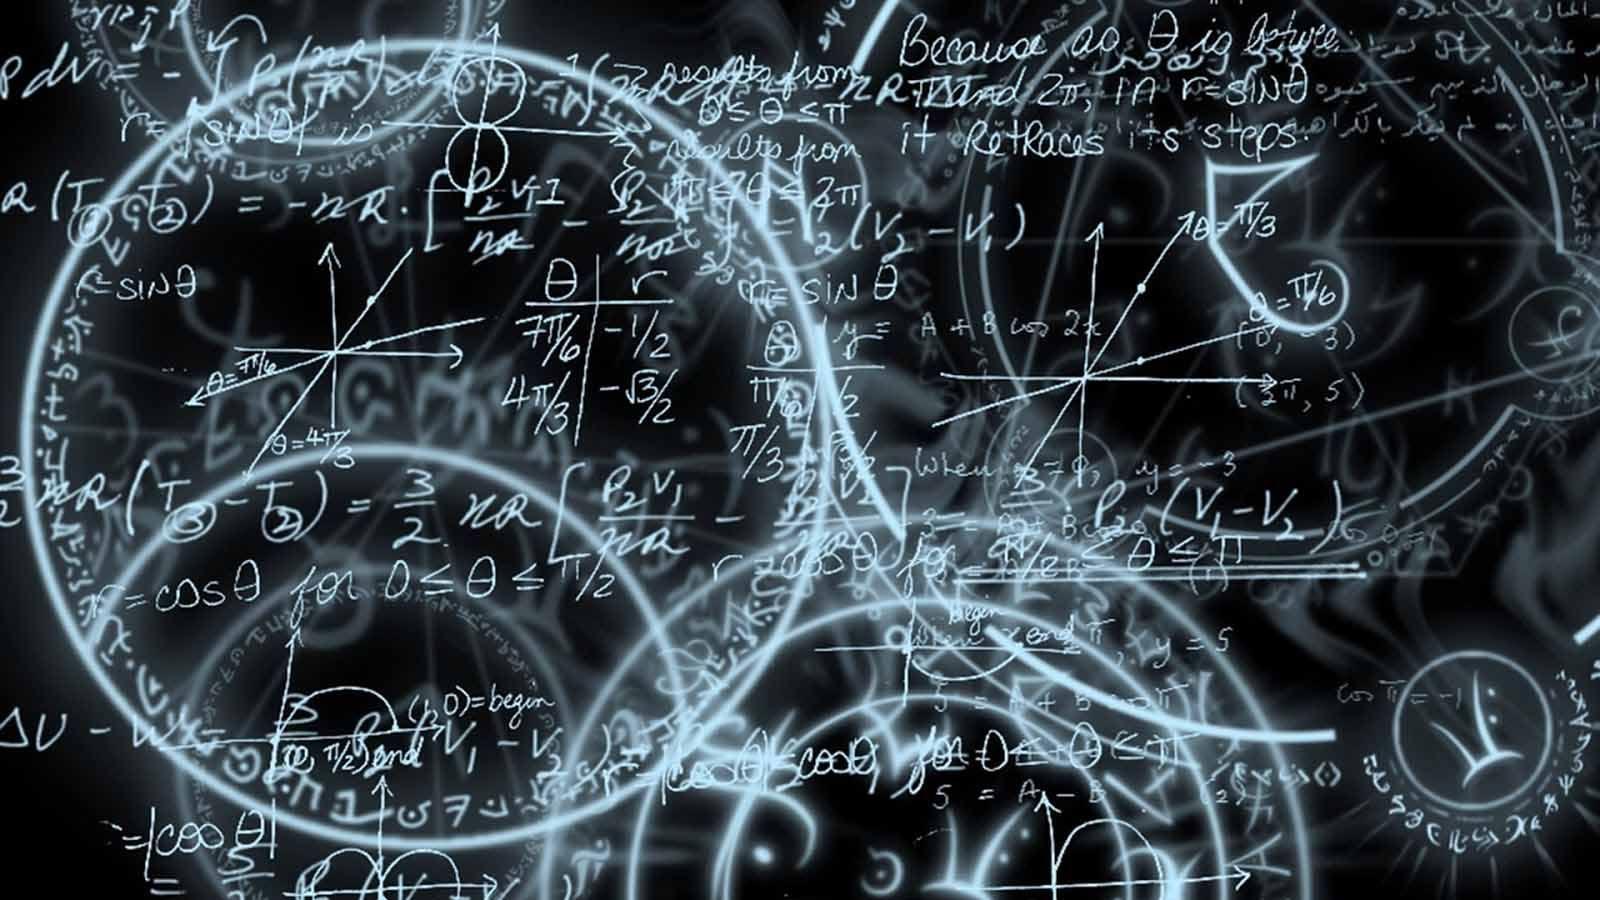 3d hd wallpapers 1080p widehdpics math wallpaper mathematics rh pinterest com